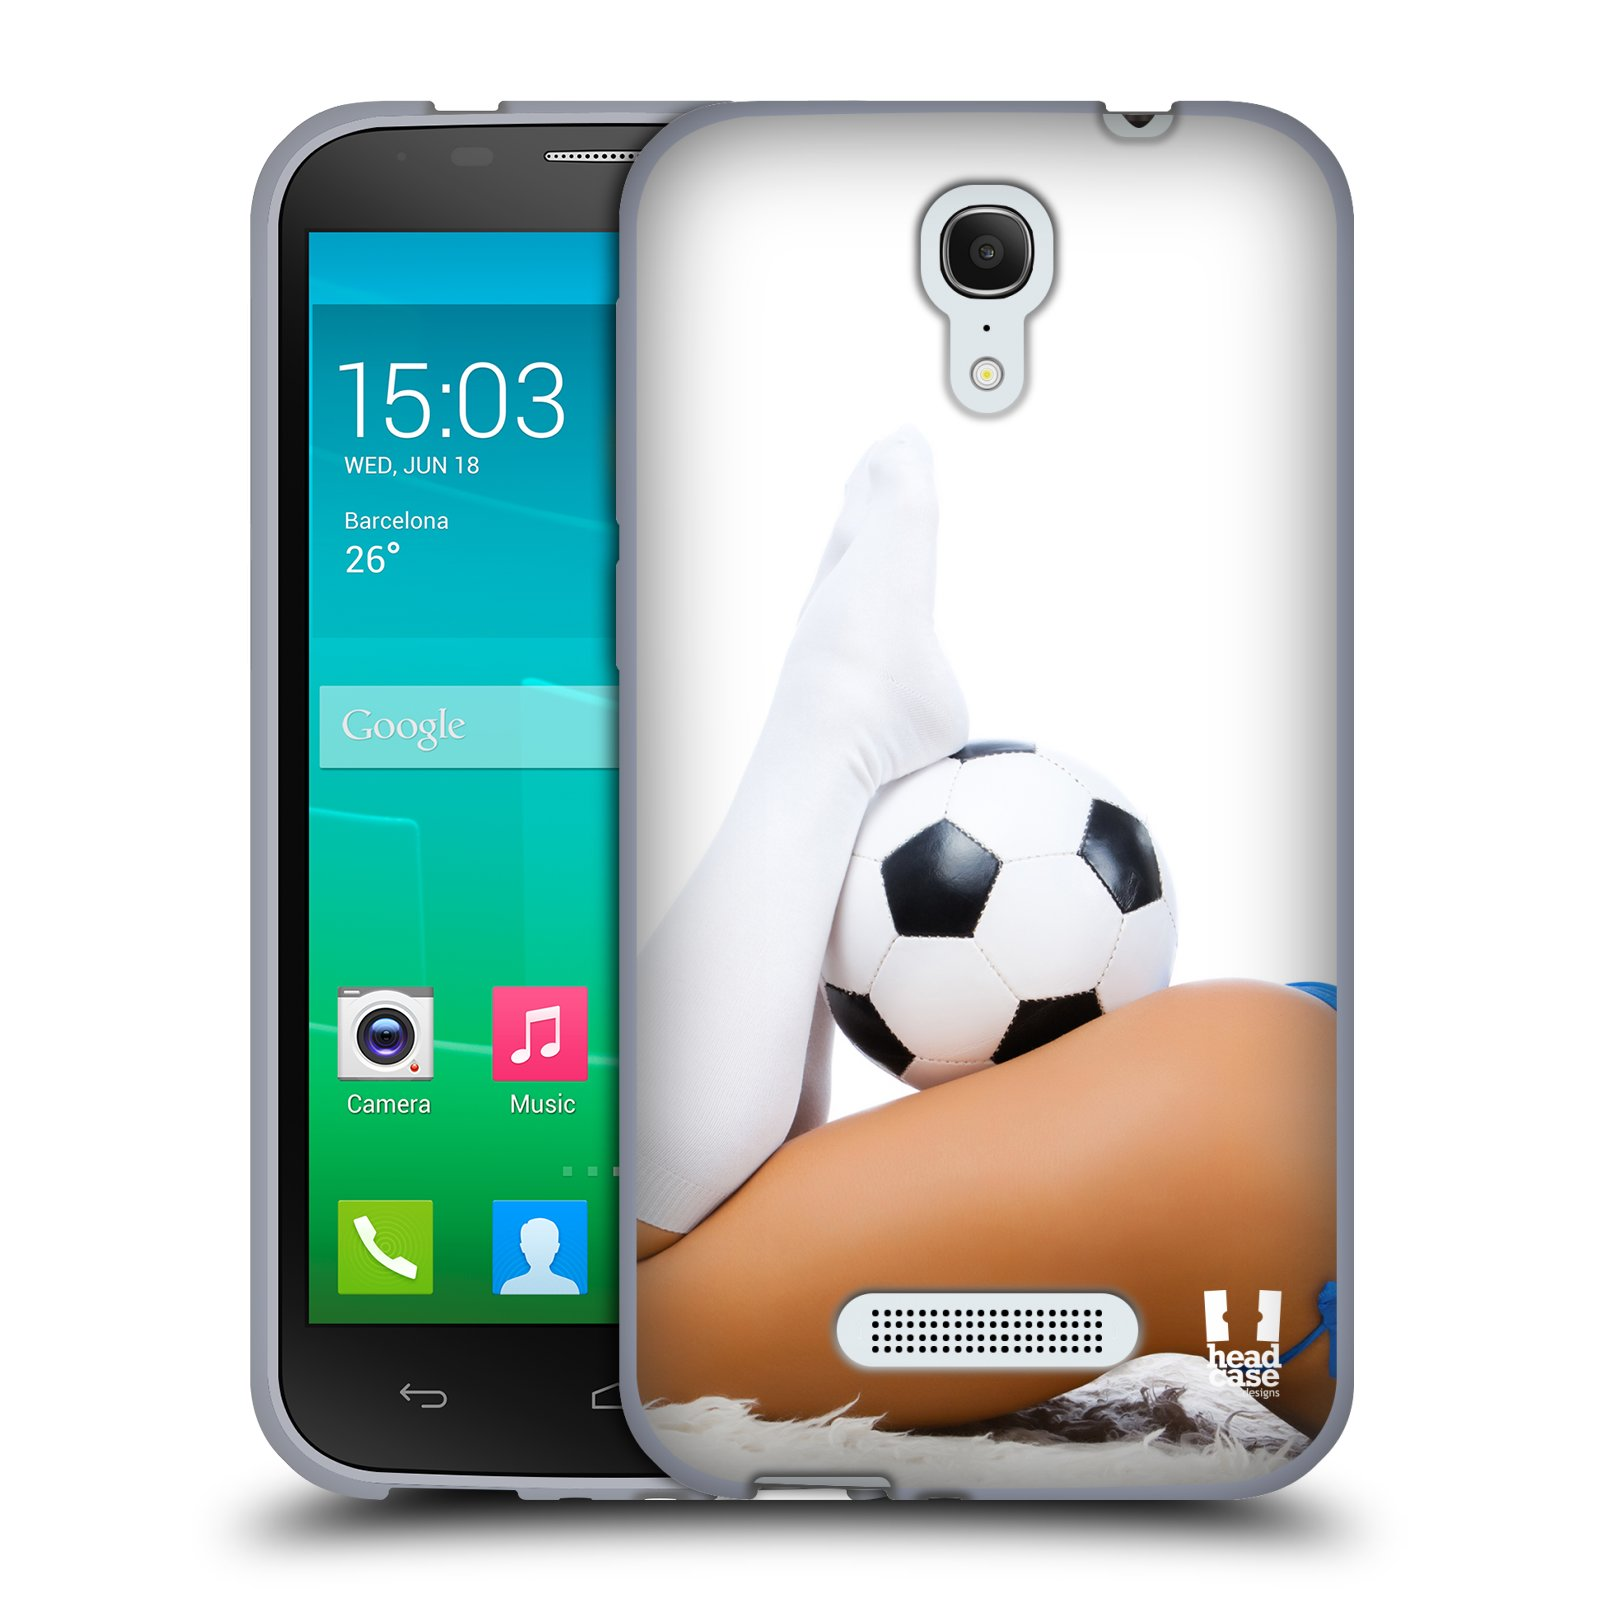 HEAD CASE silikonový obal na mobil Alcatel POP S7 vzor Fotbalové modelky PODKOLENKY